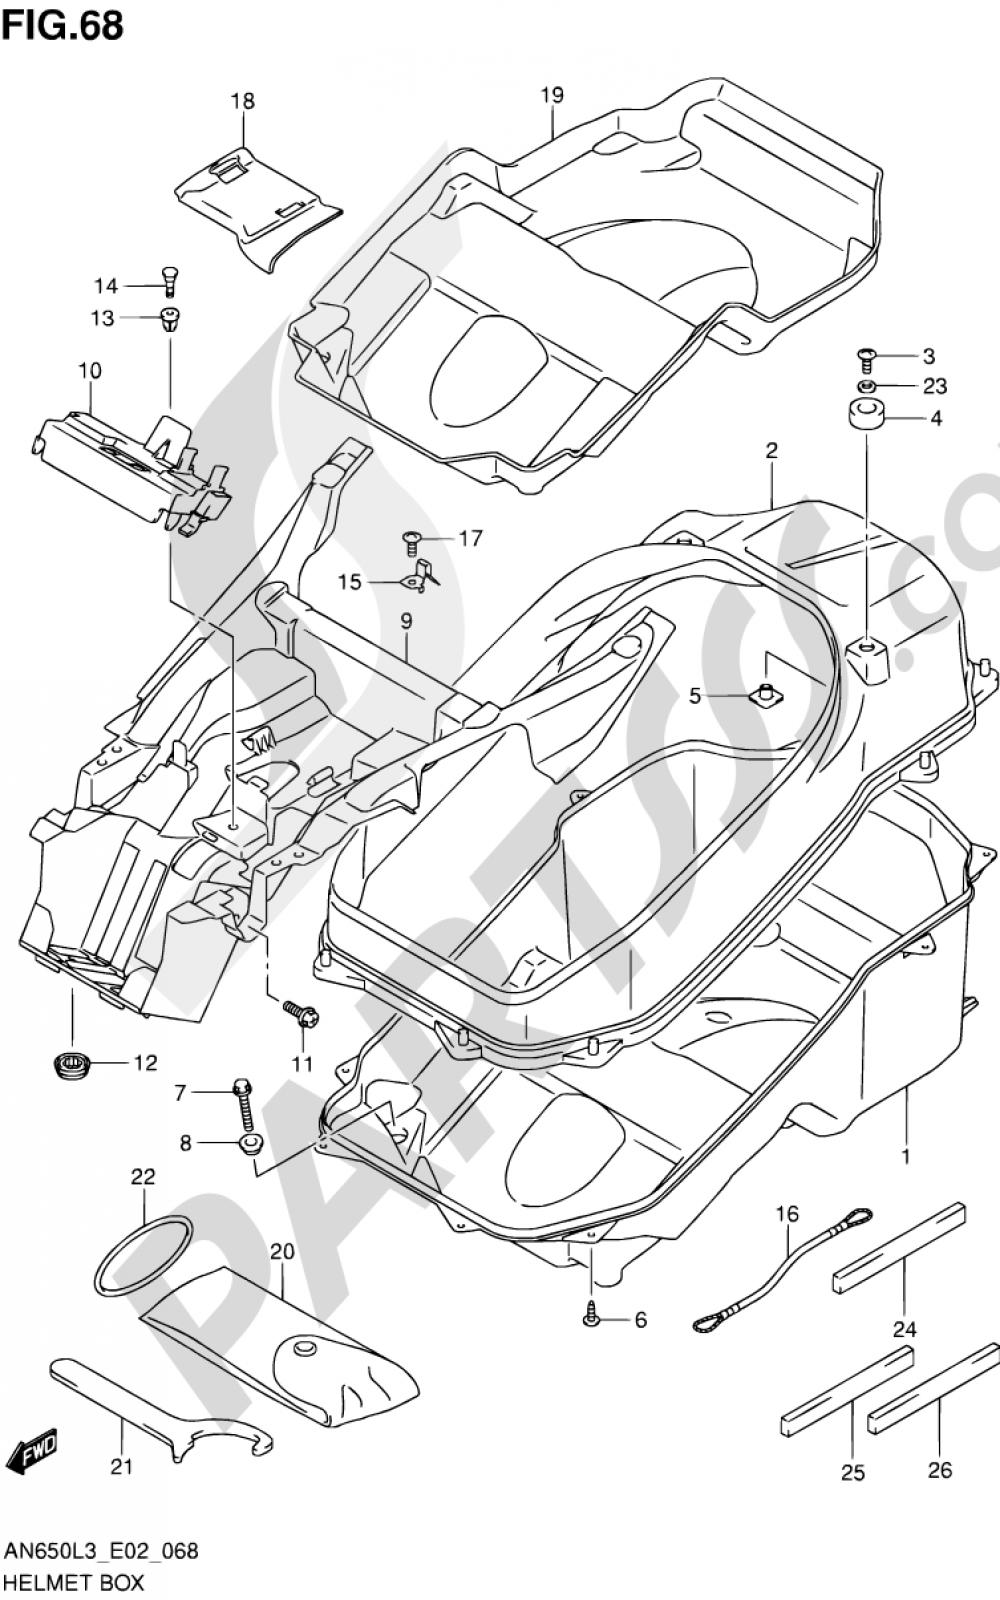 68 - HELMET BOX Suzuki BURGMAN AN650 2013